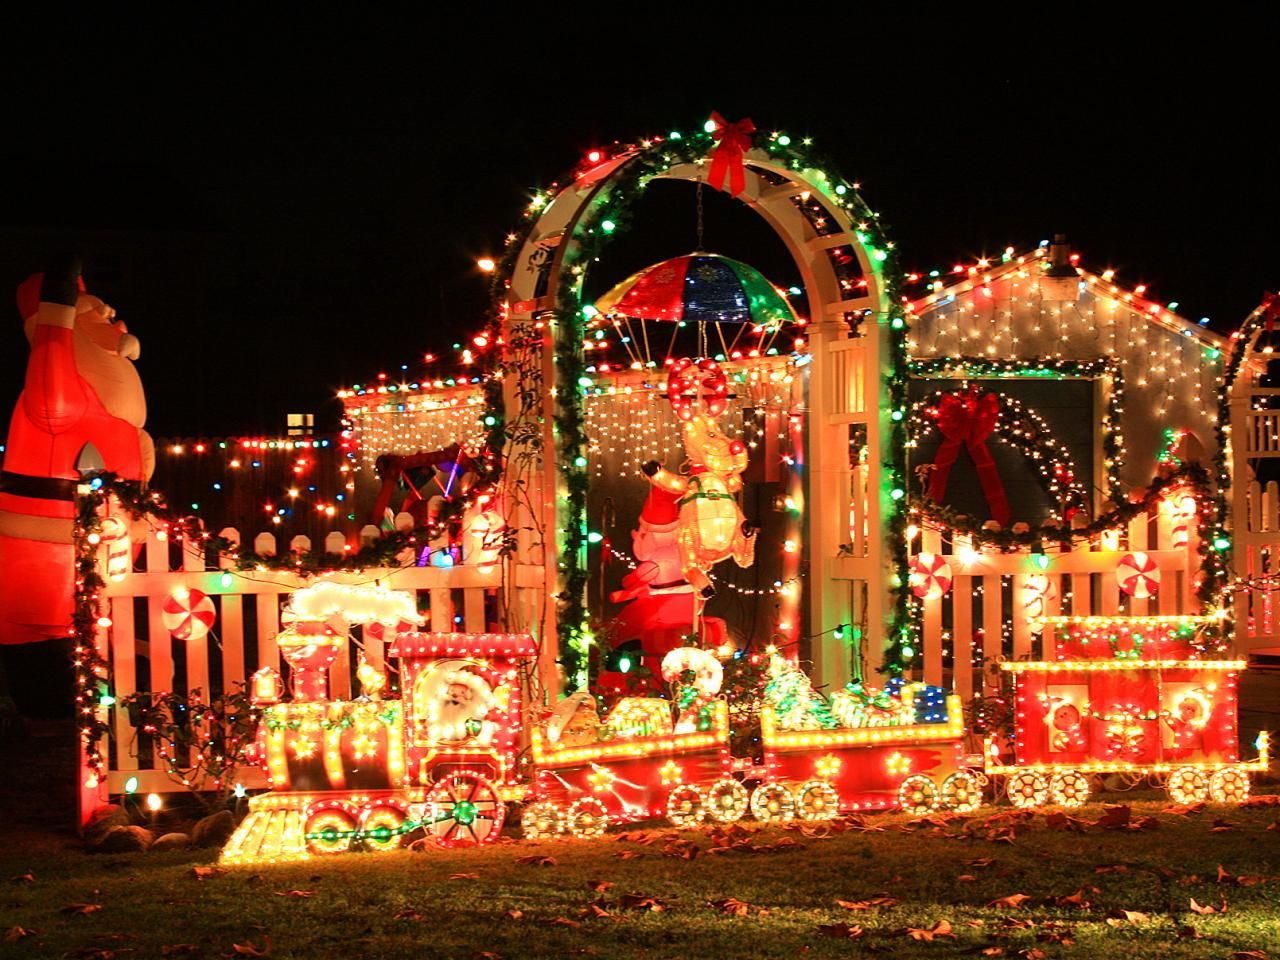 Istock 11470900colorful christmas lights exterior front yard istock 11470900colorful christmas lights exterior front yard walkways4x3gndhgtvcom1280960eg jpeg afbeelding 1280 960 pixels geschaald aloadofball Images